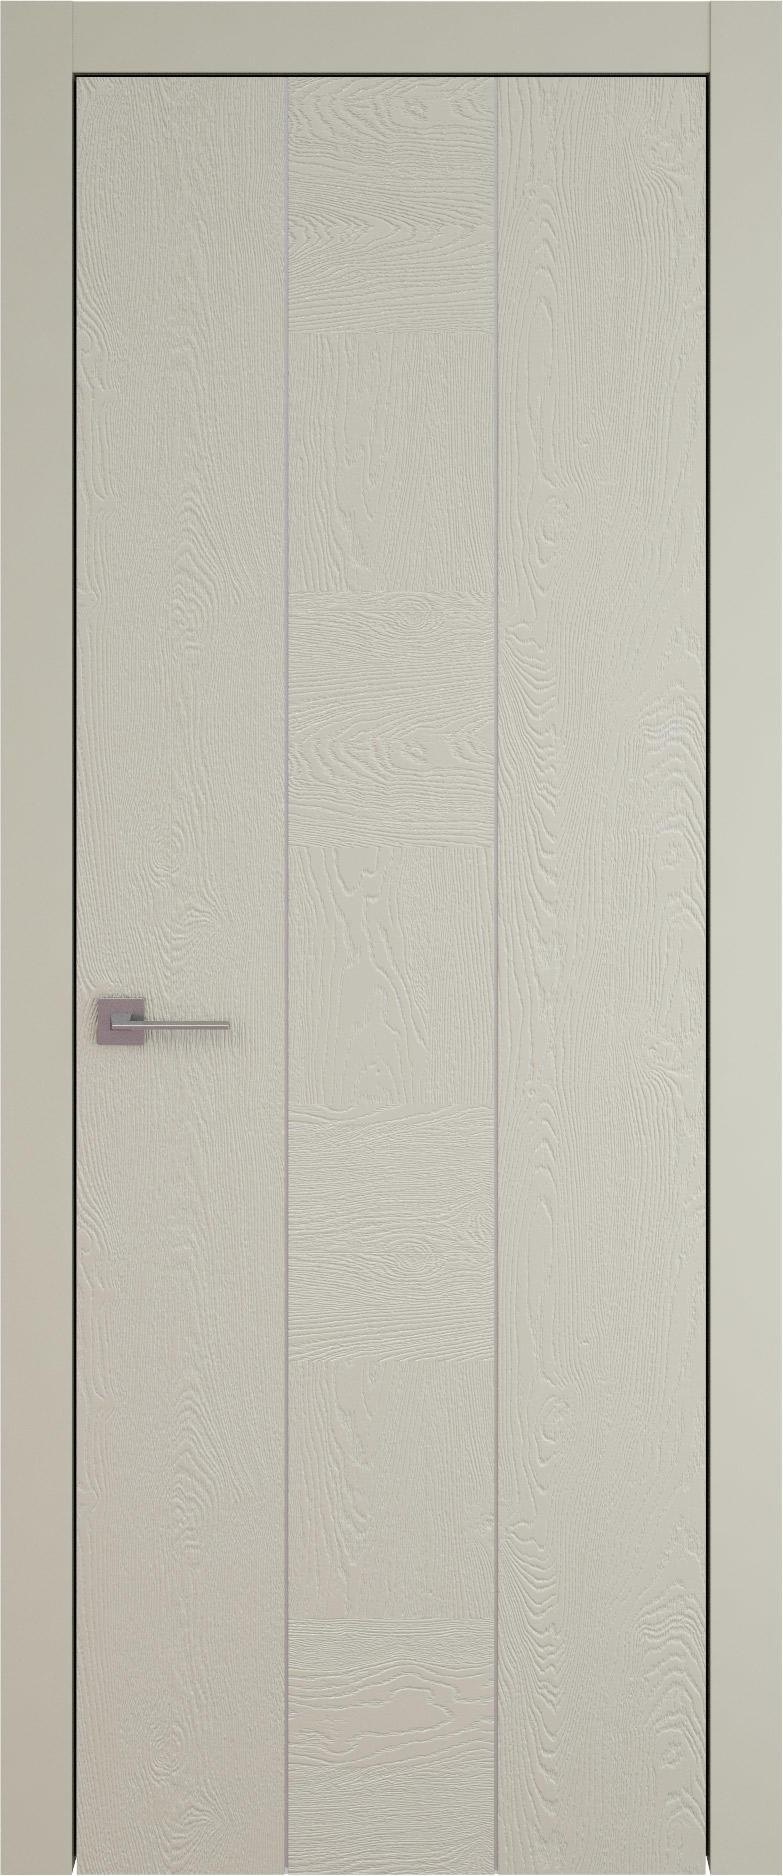 Tivoli Б-1 цвет - Серо-оливковая эмаль по шпону (RAL 7032) Без стекла (ДГ)